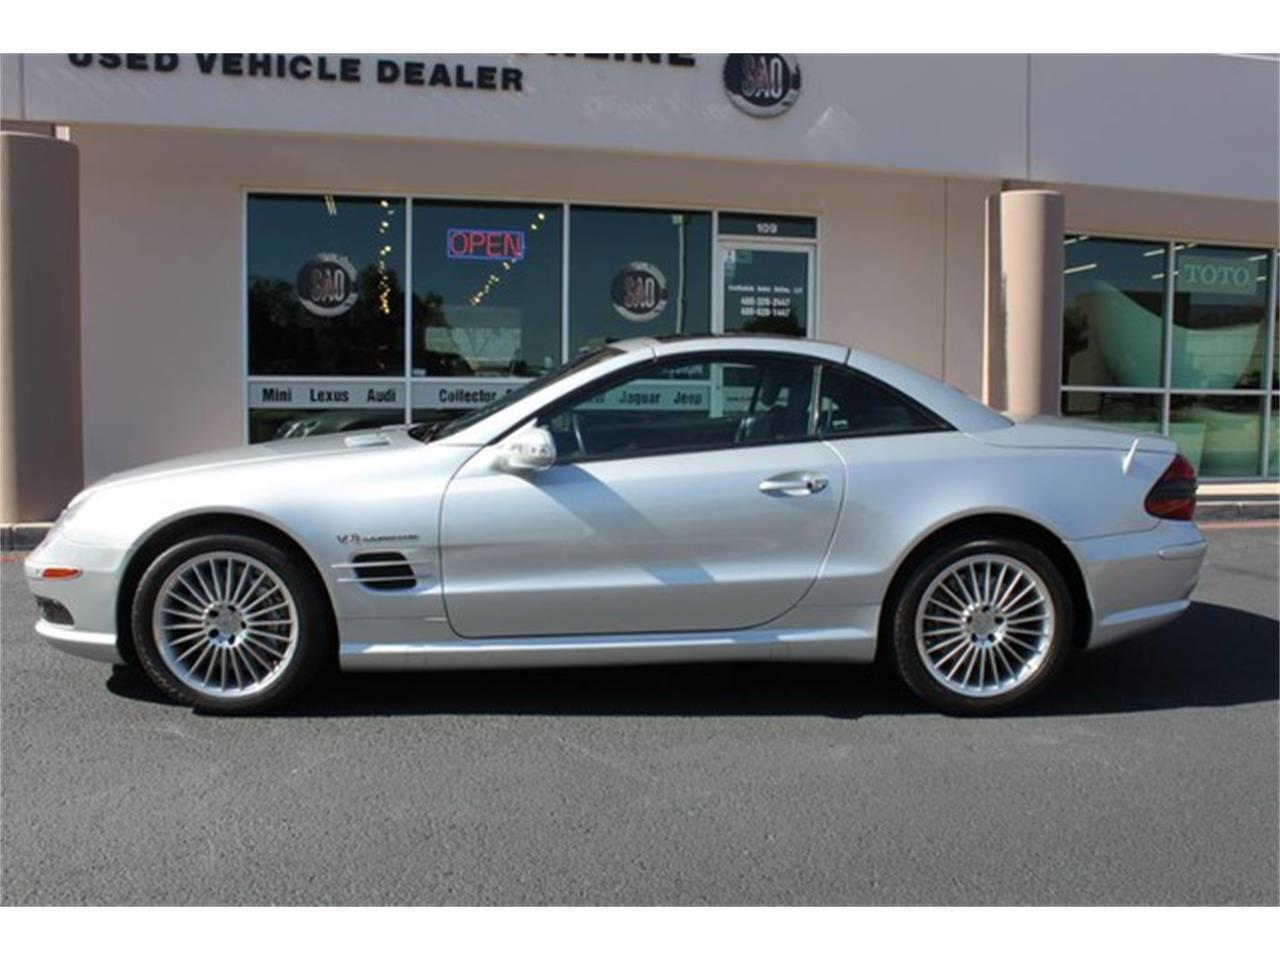 2003 Mercedes-Benz SL-Class (CC-1355434) for sale in Scottsdale, Arizona